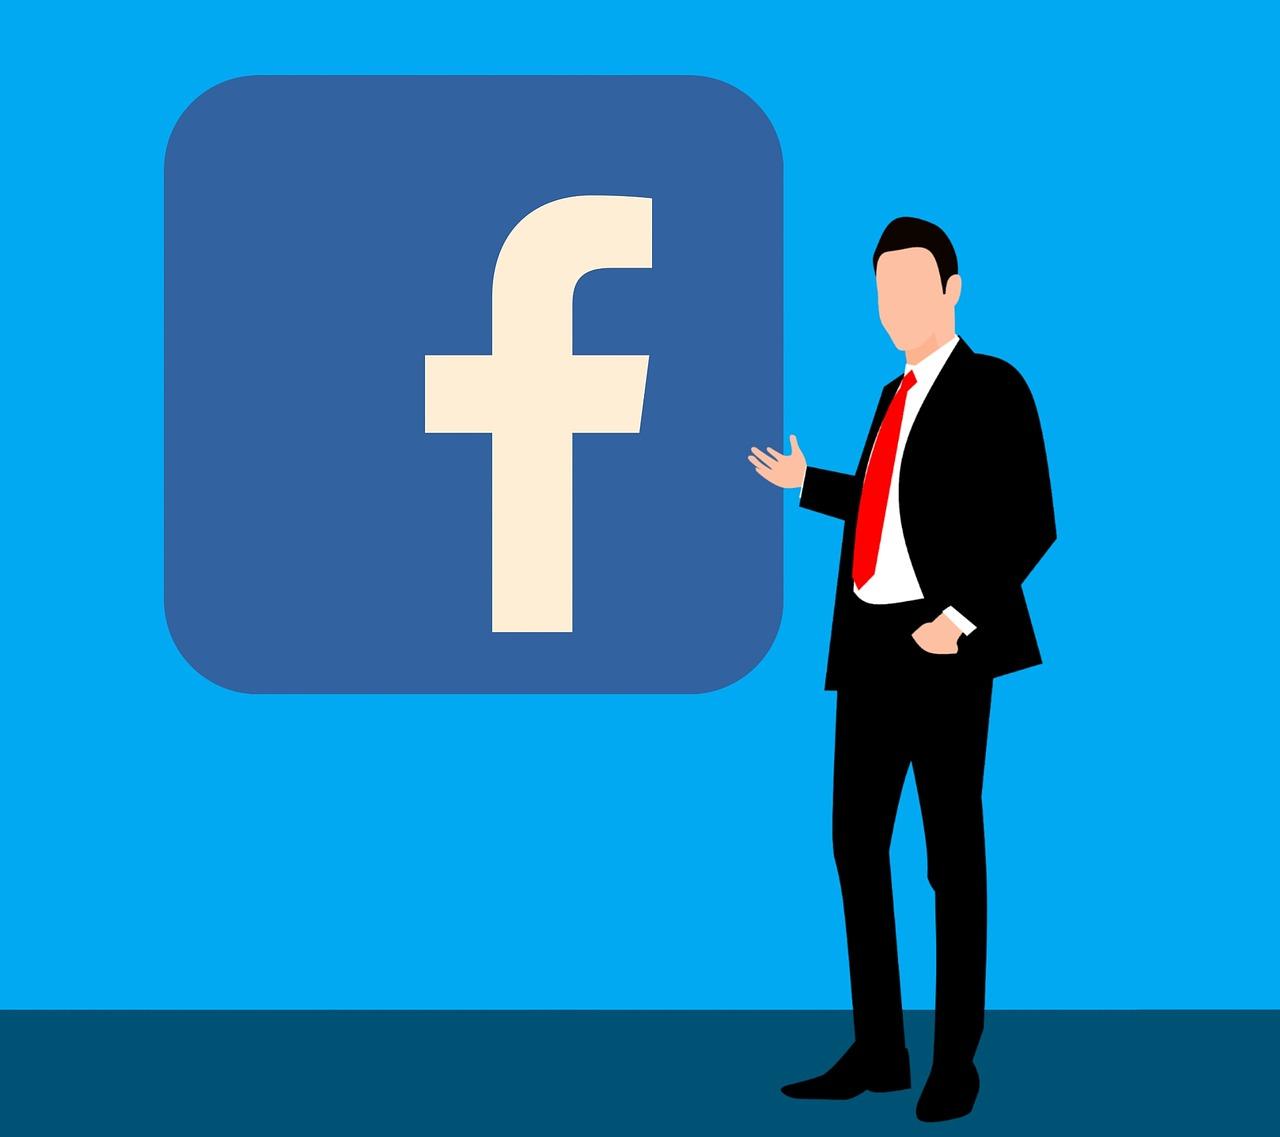 facebook-icon-3250006_1280